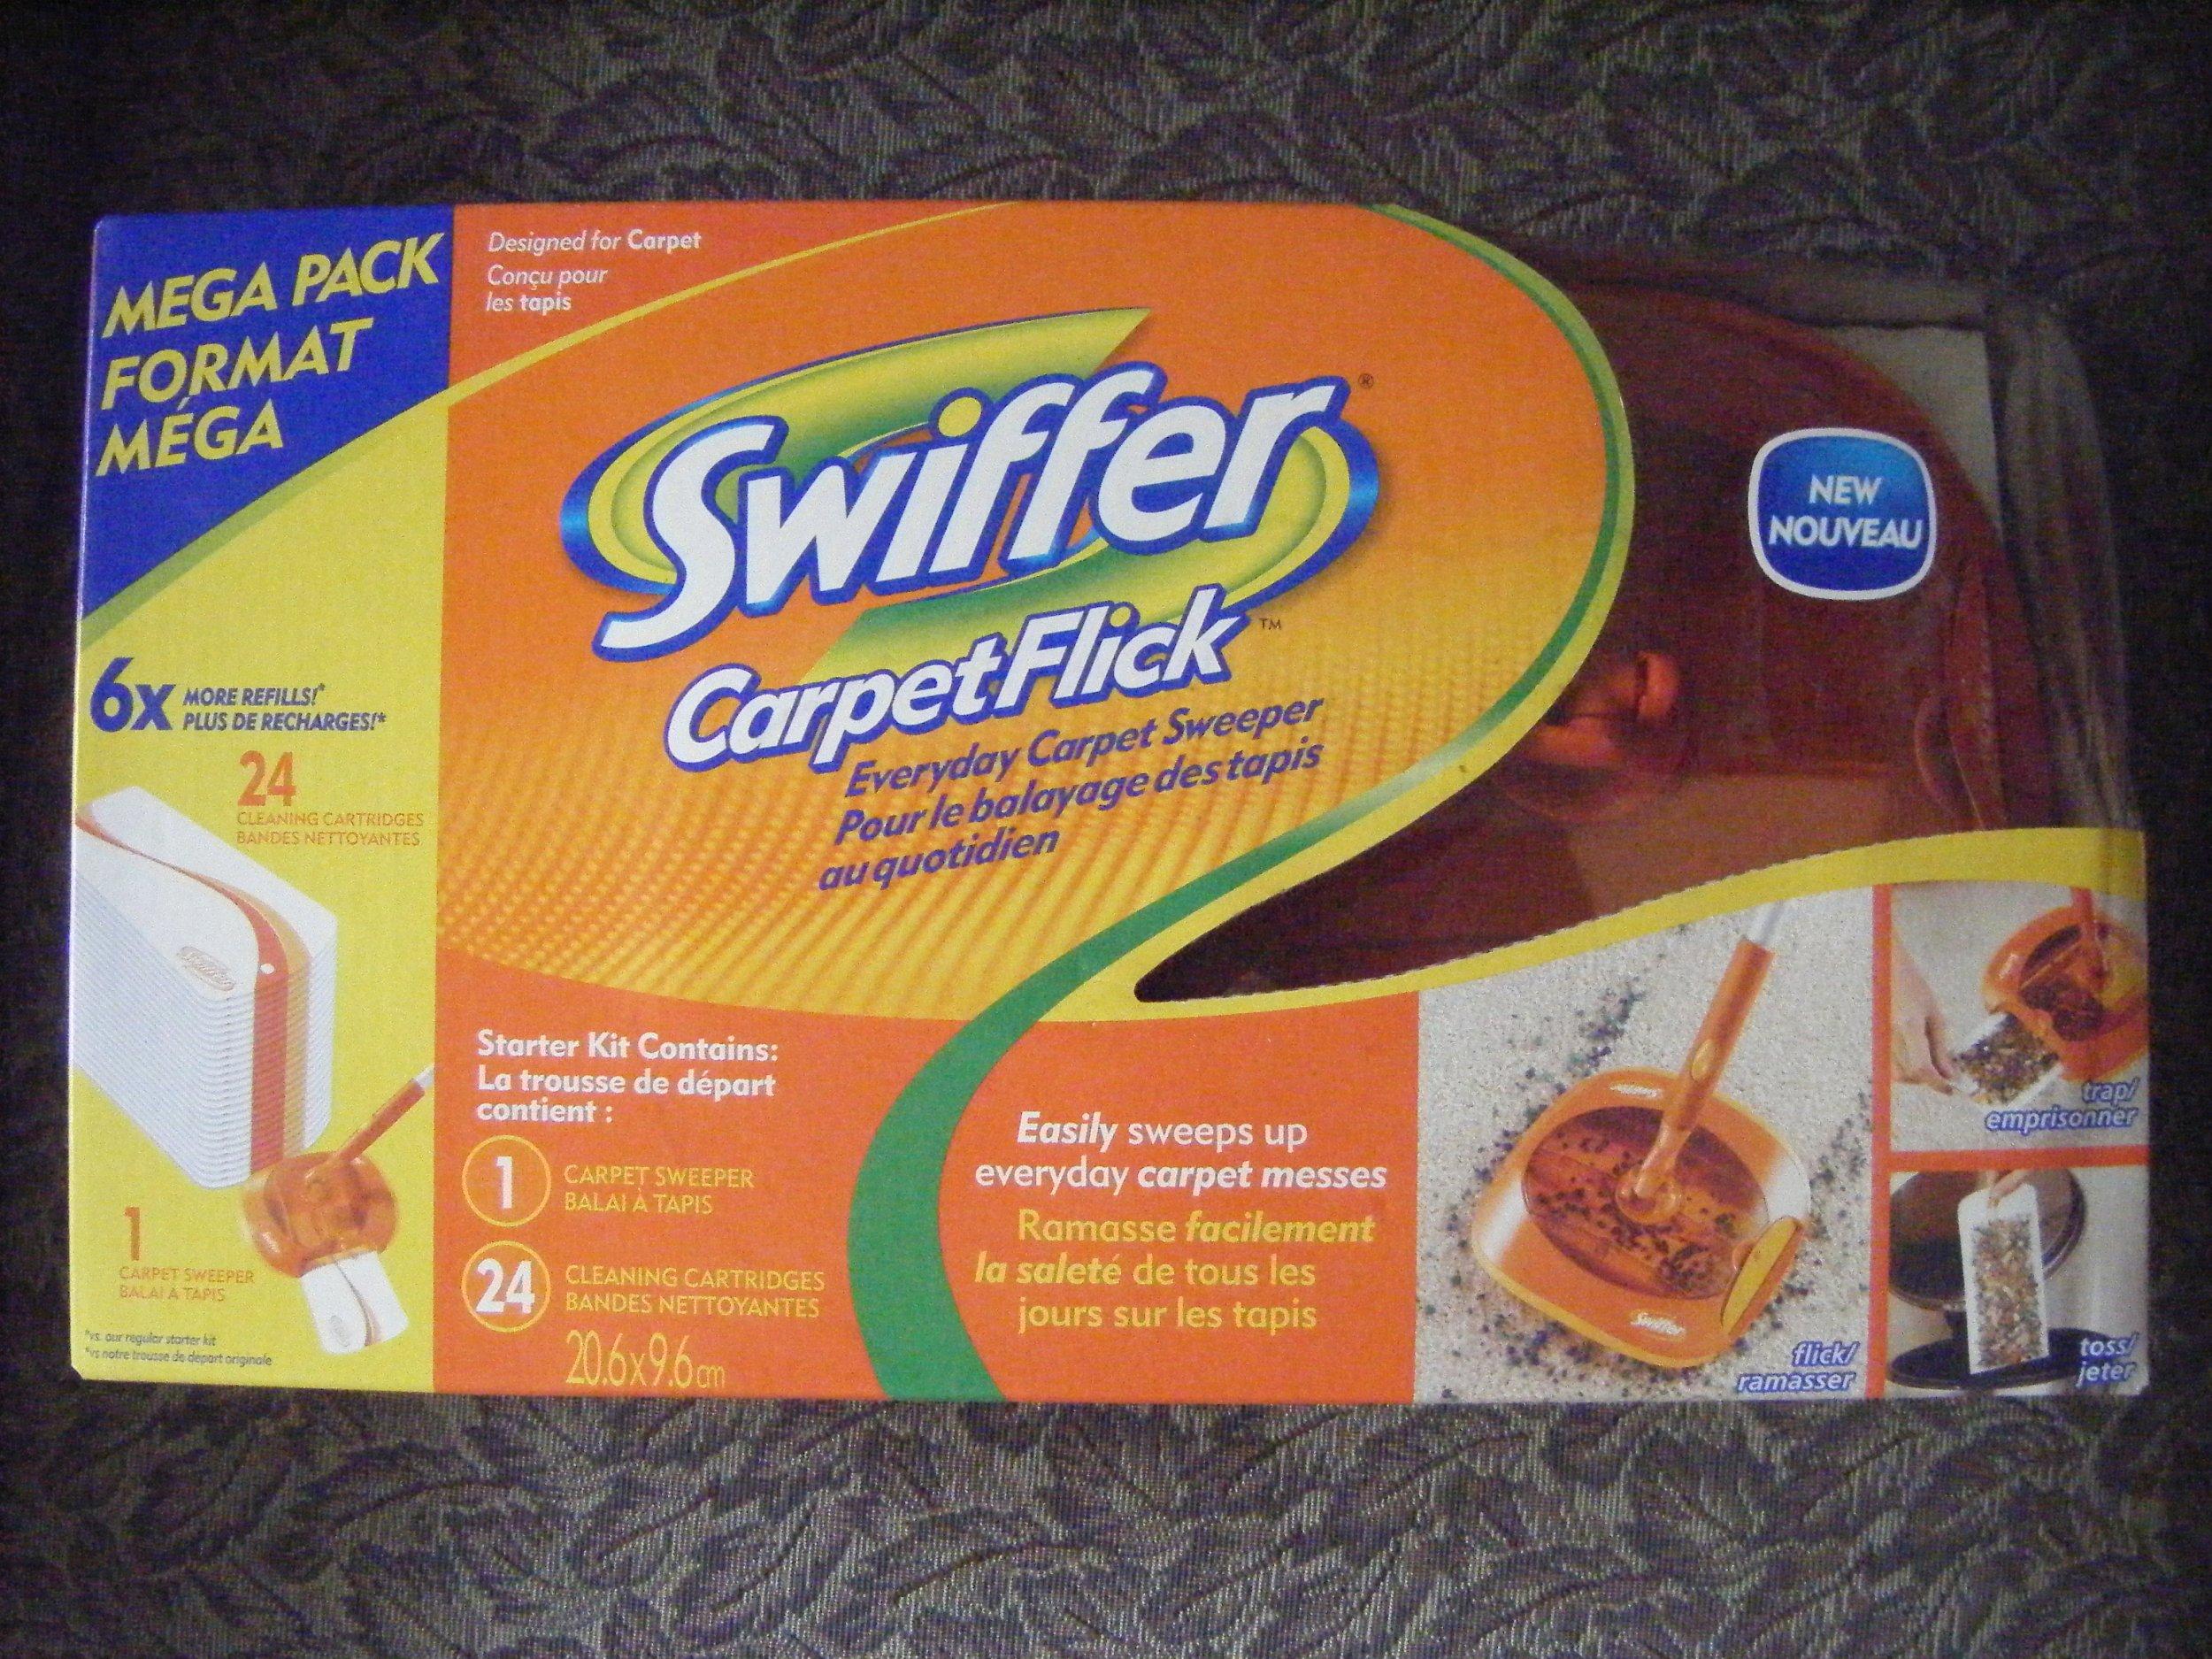 Swiffer Carpet Flick Starter Kit - 1 Carpet Sweeper - 24 Cleaning Cartridges by Swiffer